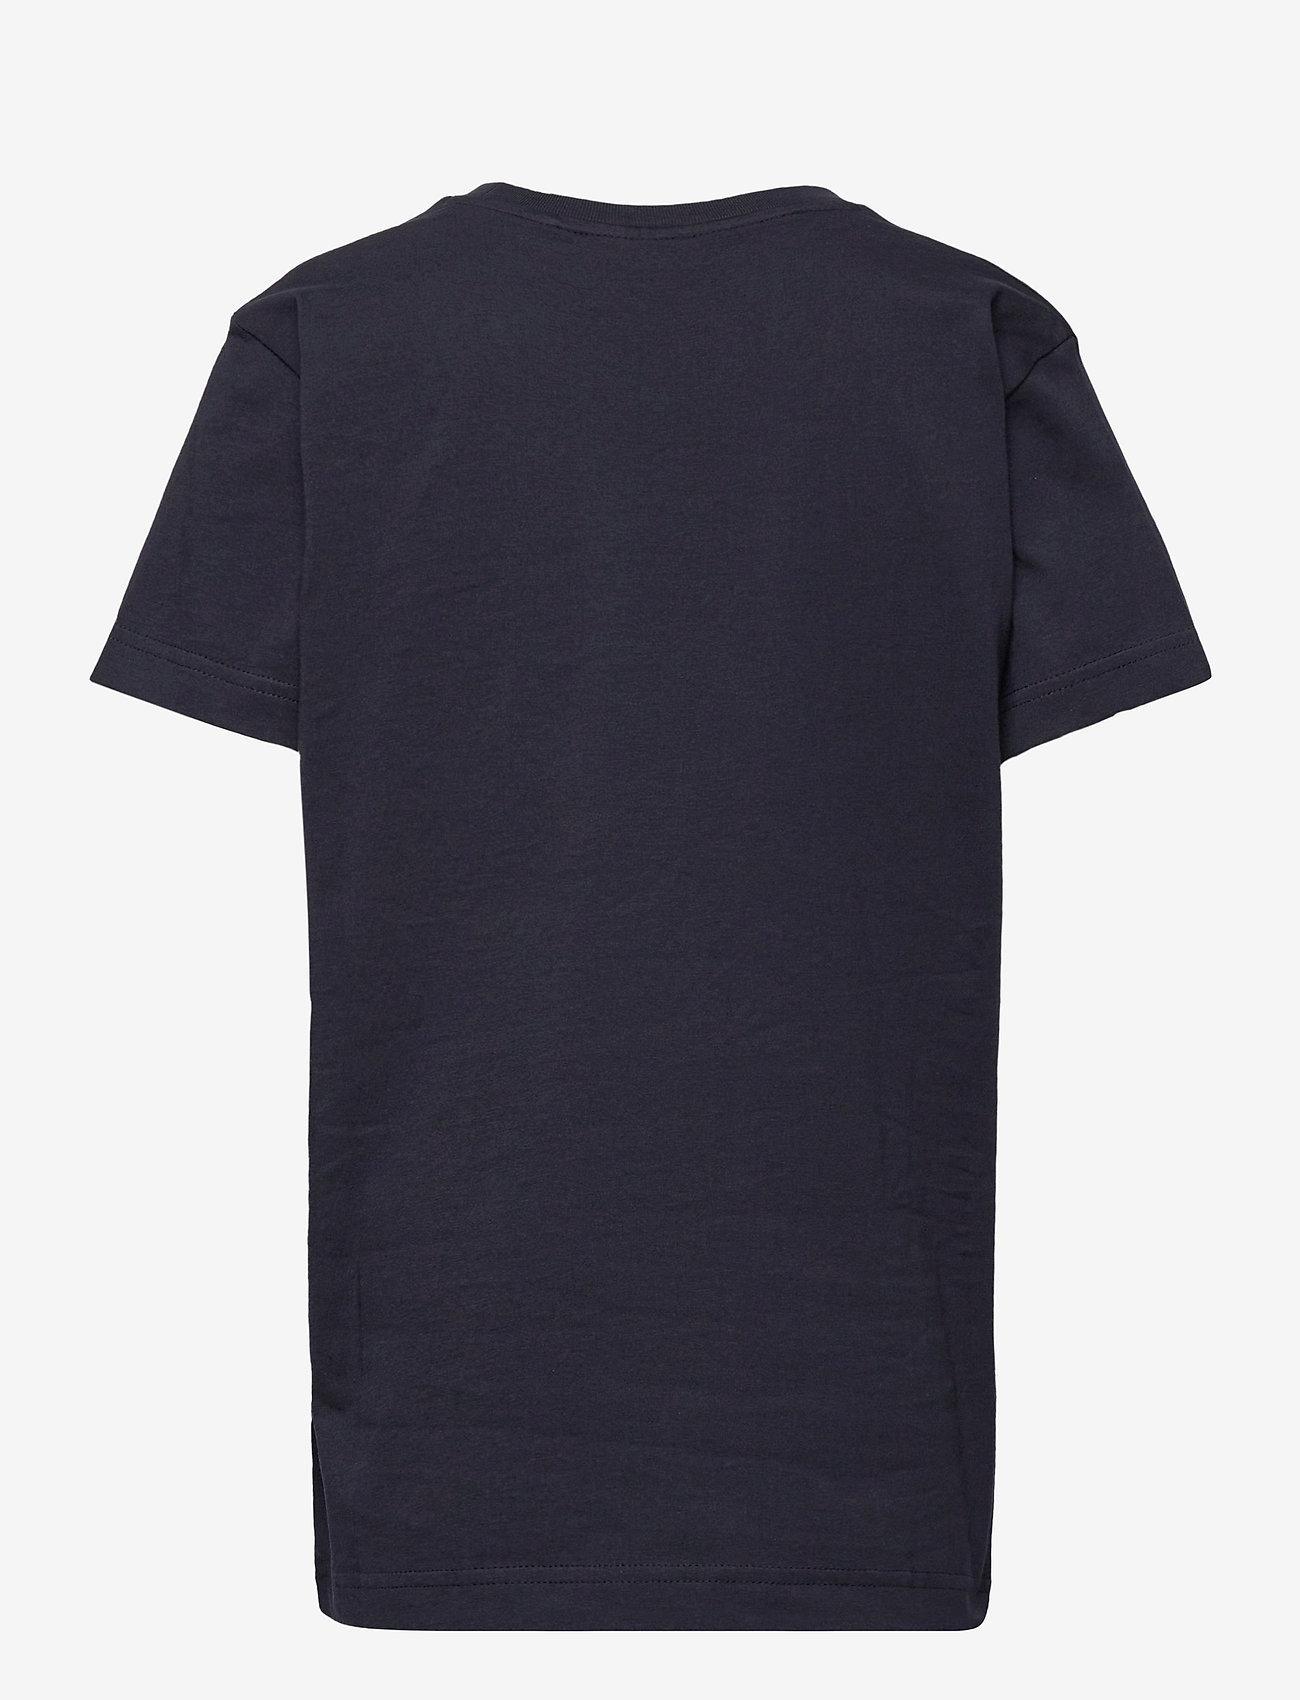 GANT - ARCHIVE SHIELD SS T-SHIRT - short-sleeved - evening blue - 1